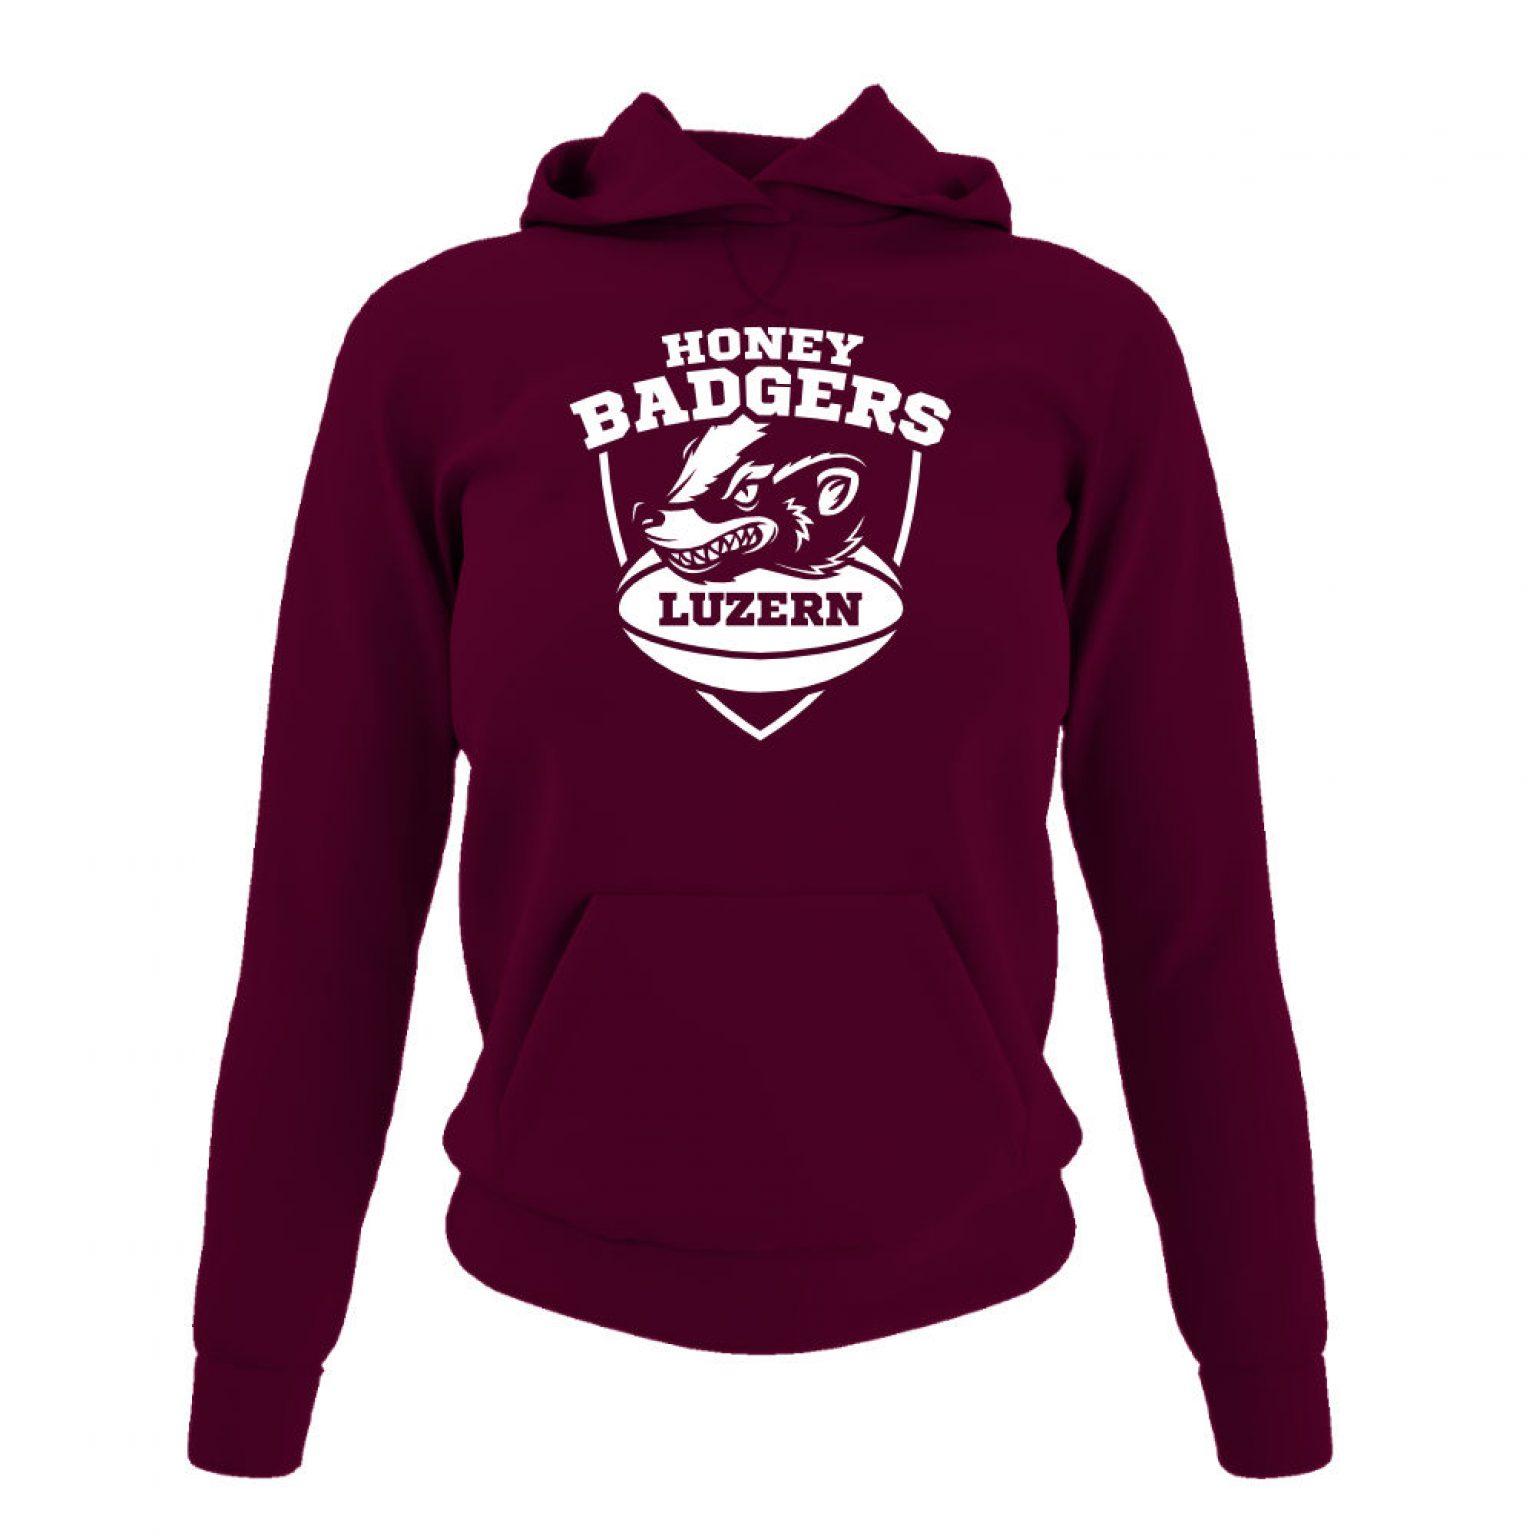 Honeybadgers hoodie damen burgundy